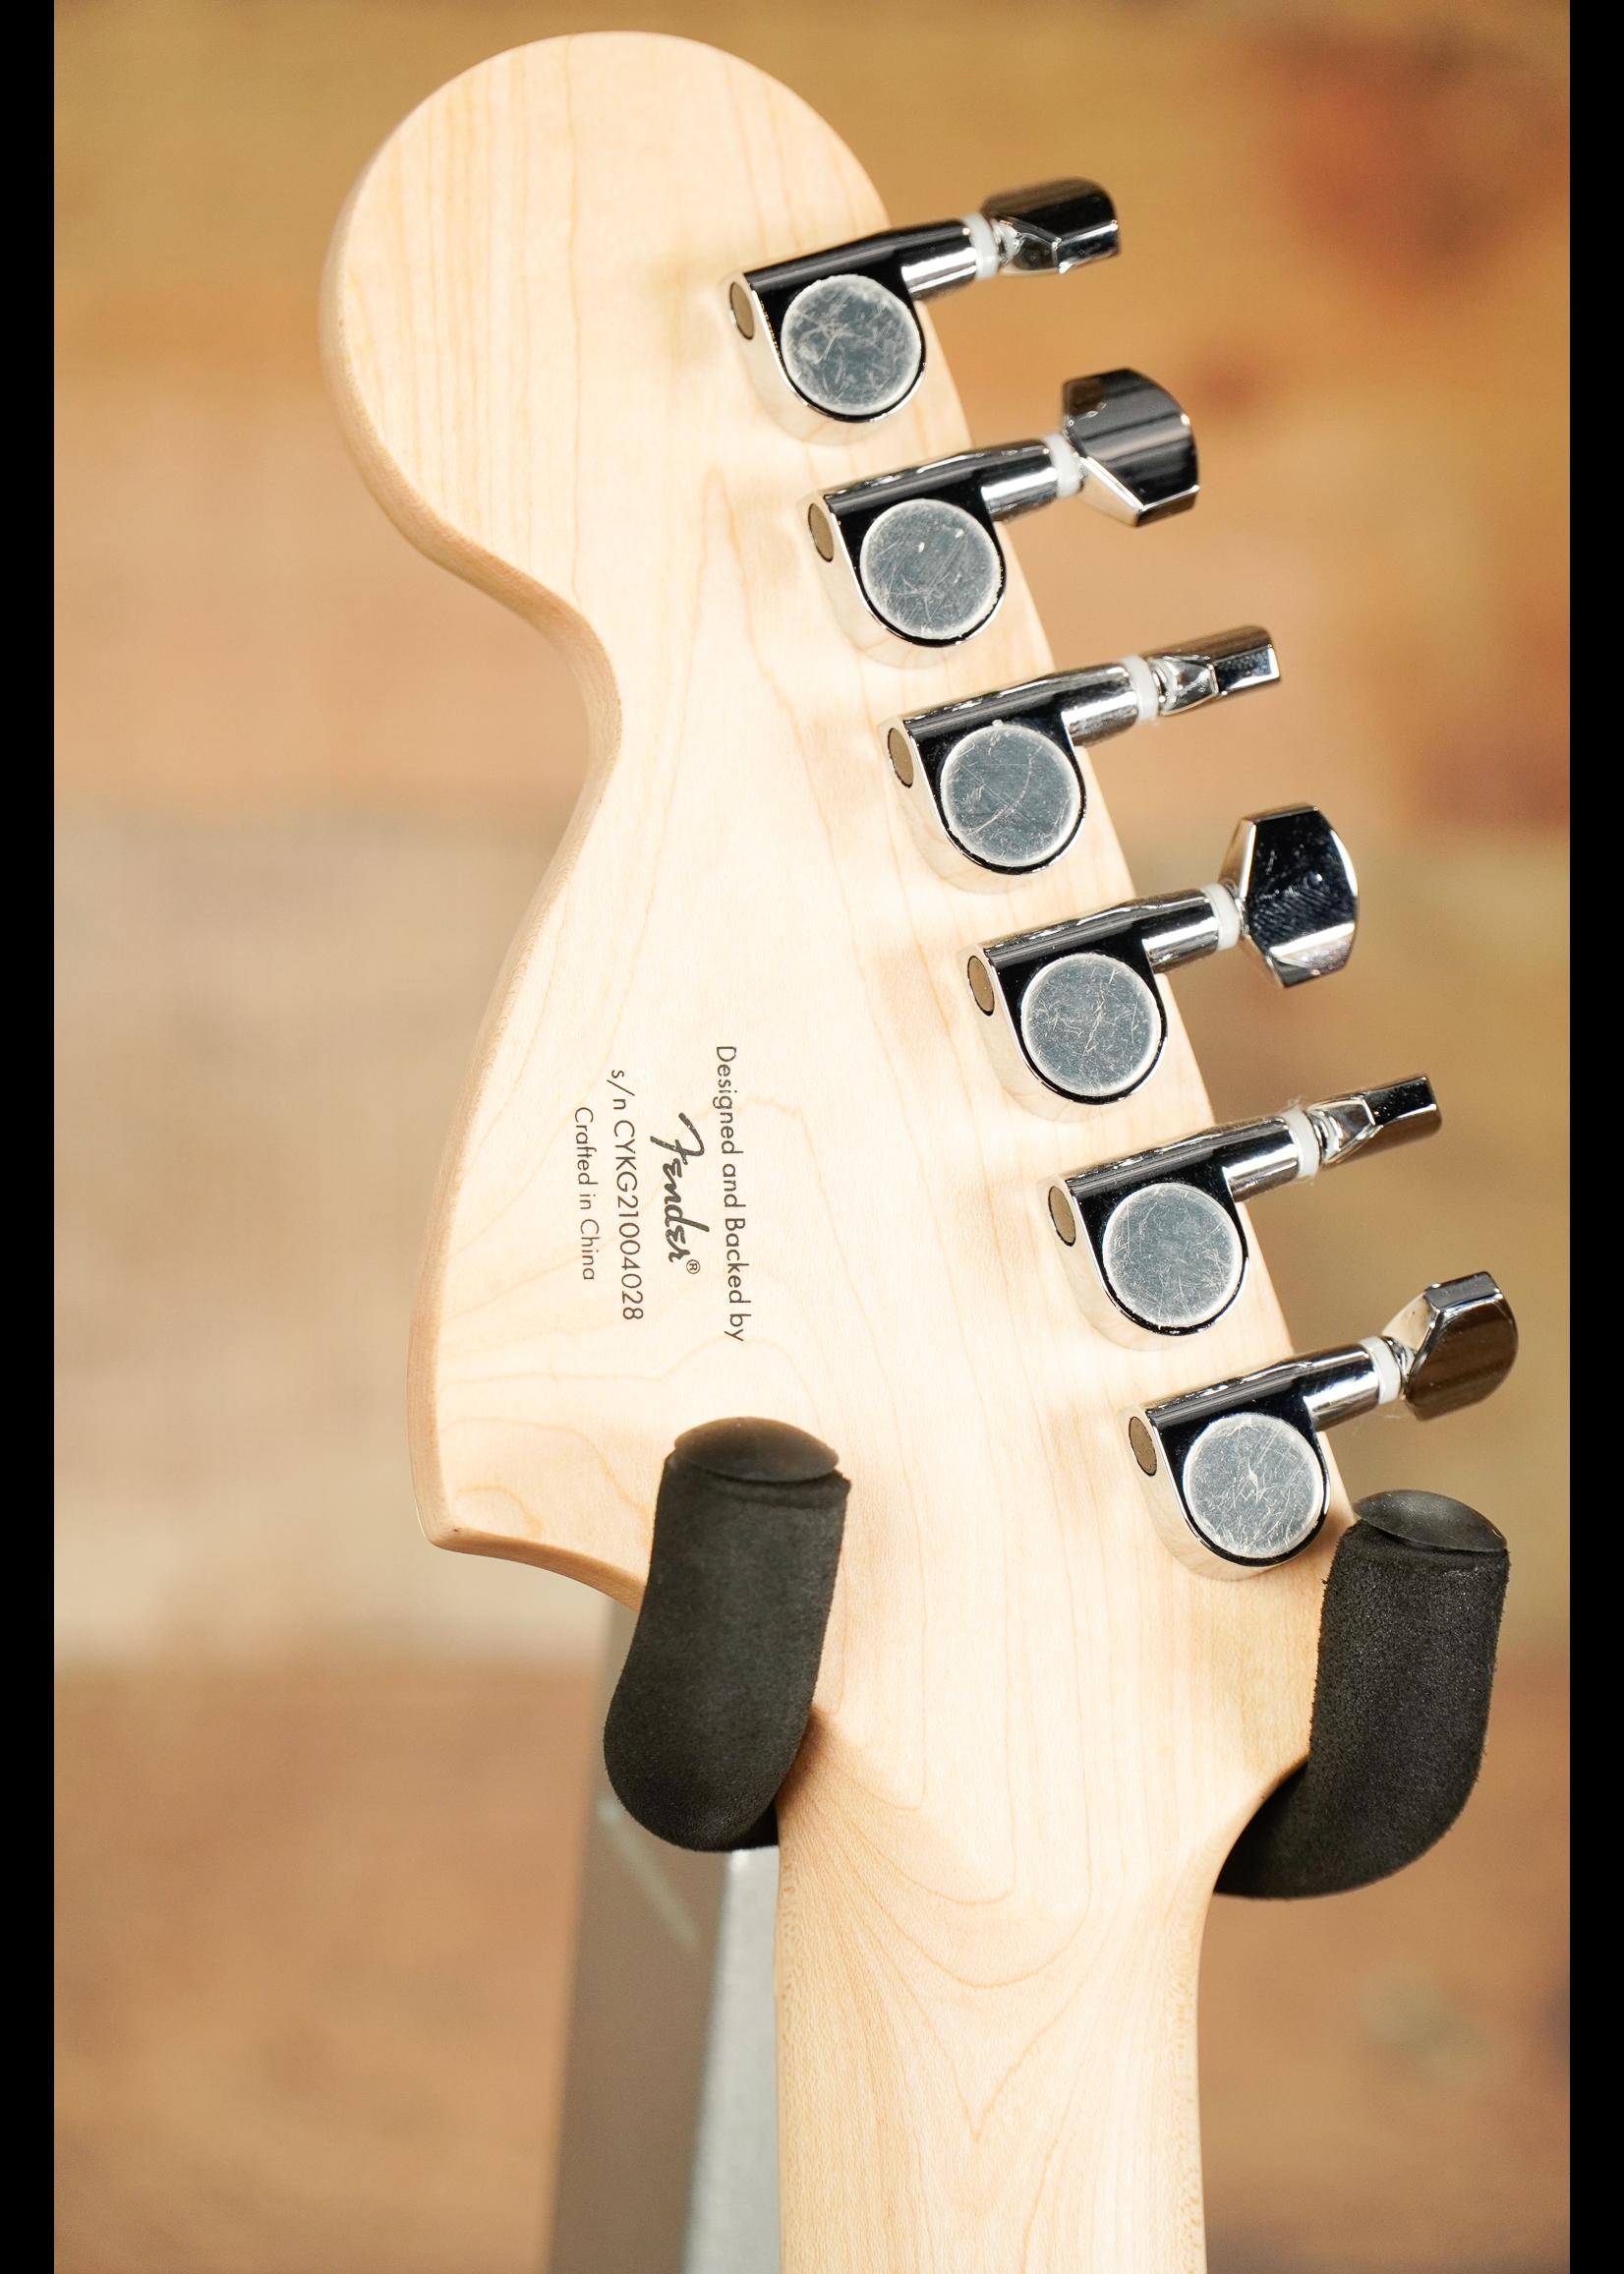 Squier Fender Affinity Series™ Stratocaster® FMT HSS, Maple Fingerboard, White Pickguard, Sienna Sunburst